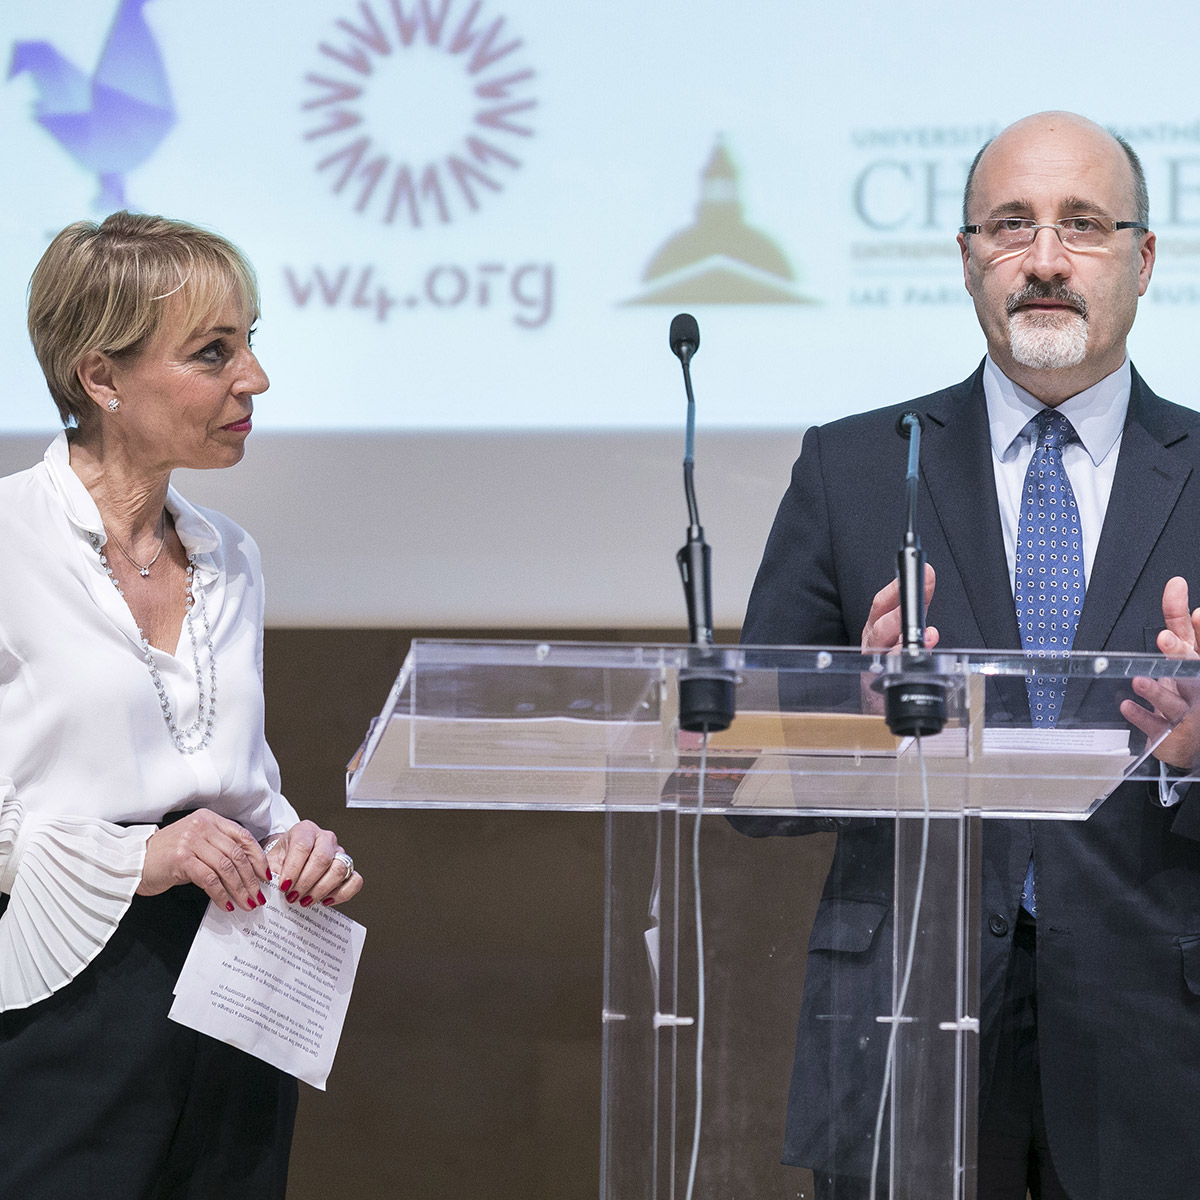 womenintech-summit-isabelle-magyar